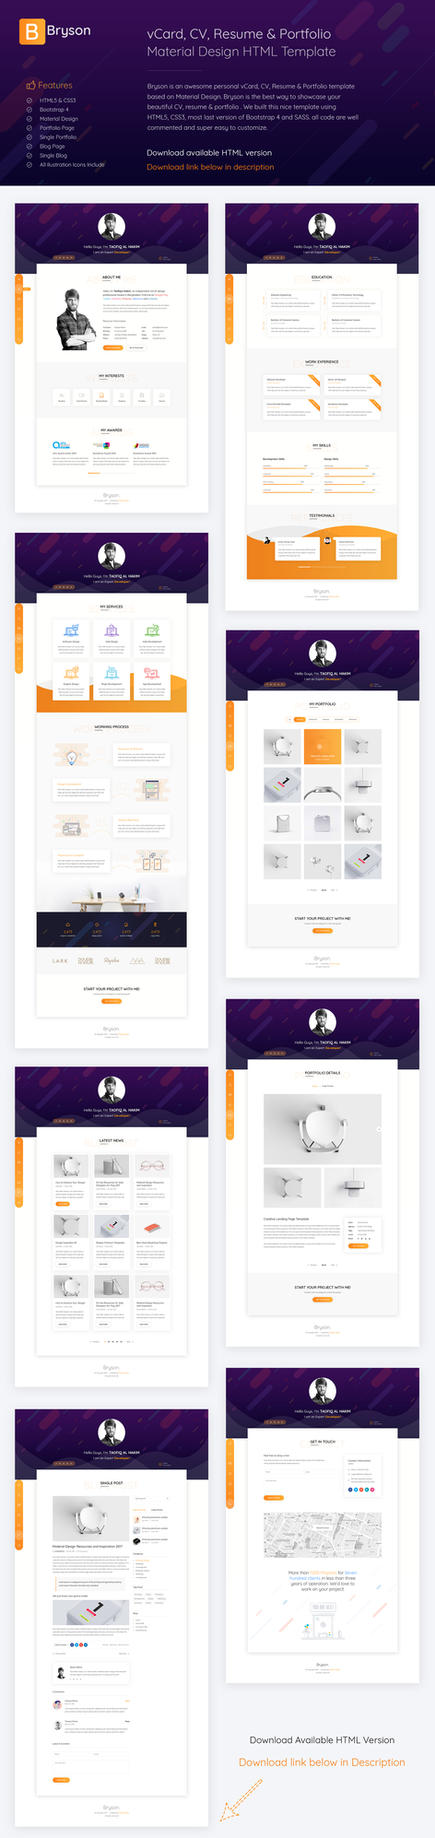 bryson vcard cv resume portfolio template by arahimdesign